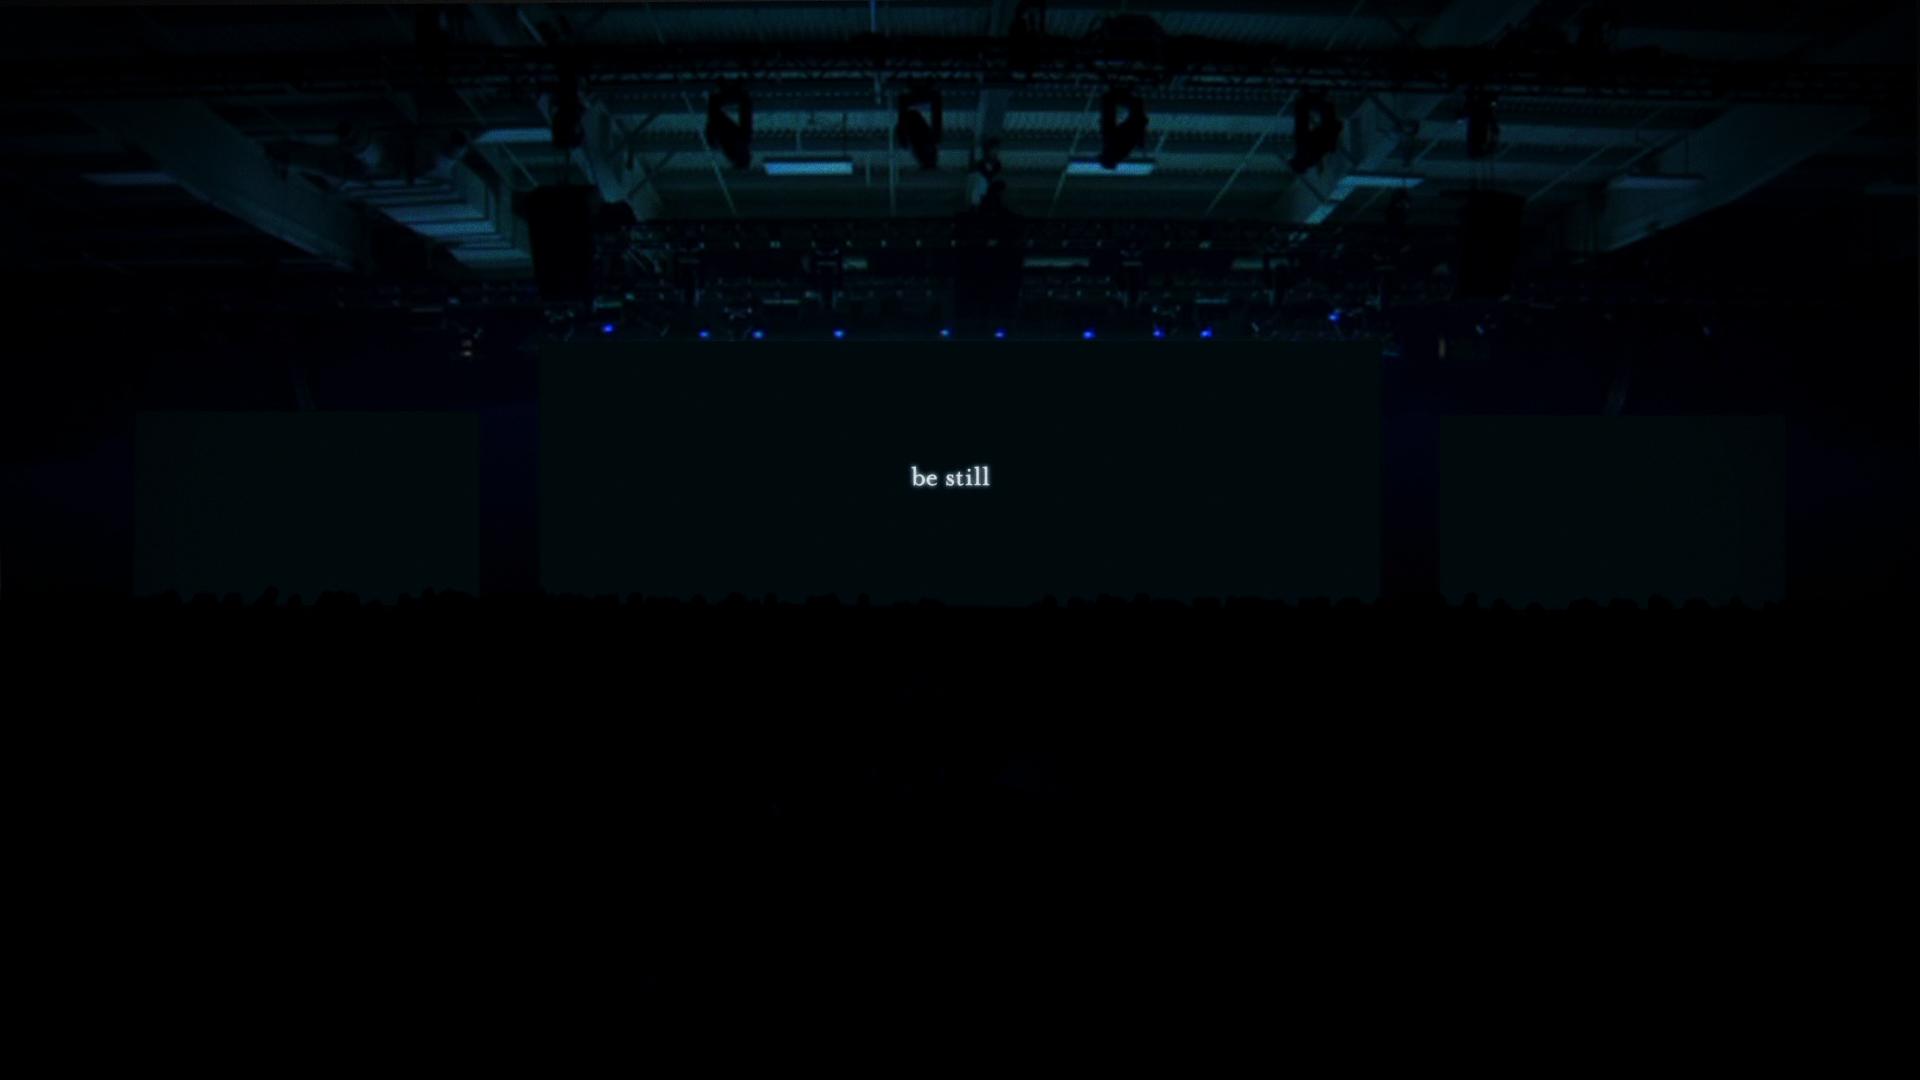 GIL_HCV_video_01